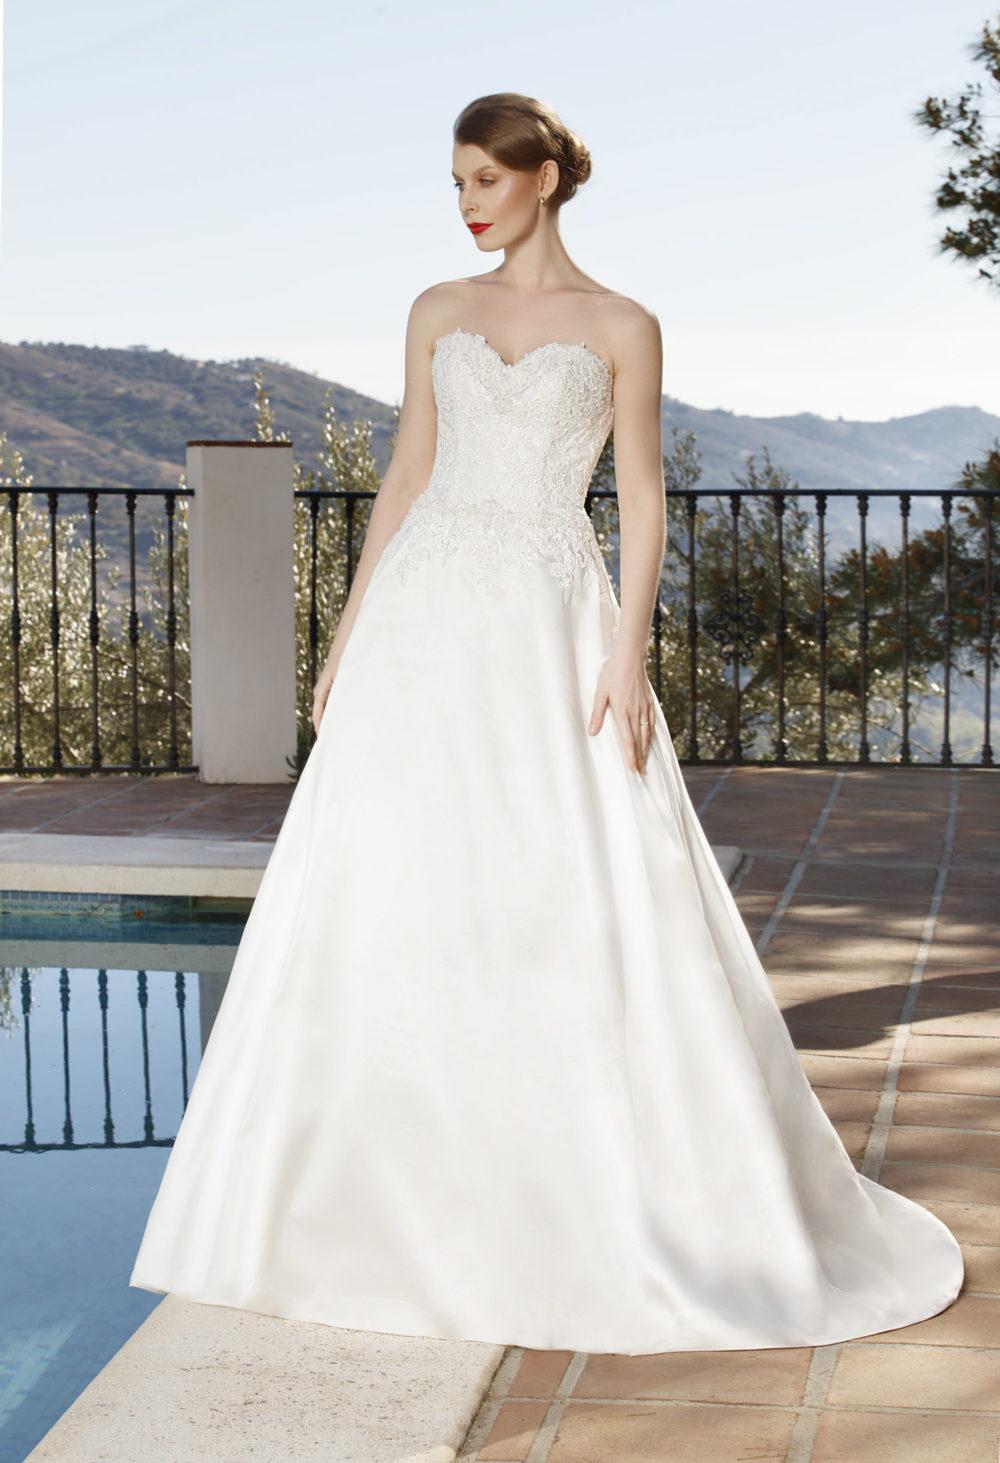 Mariages: abito da sposa Curvy 2020 a Vicenza, Verona, Padova, Veneto Torino